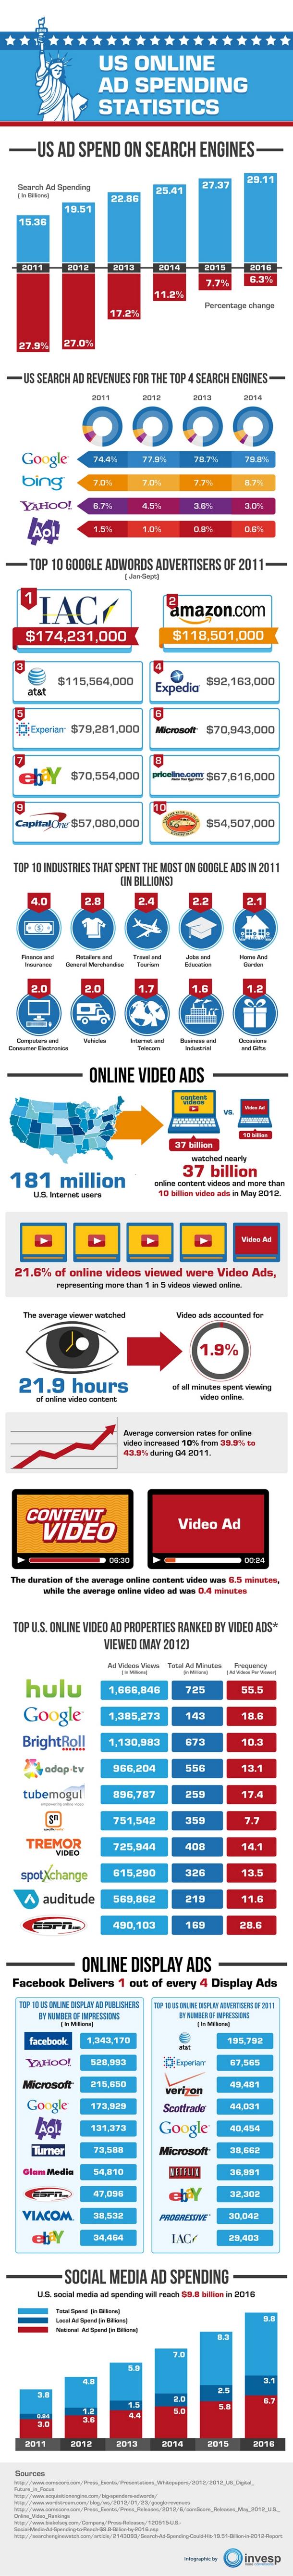 online ad spending infographic